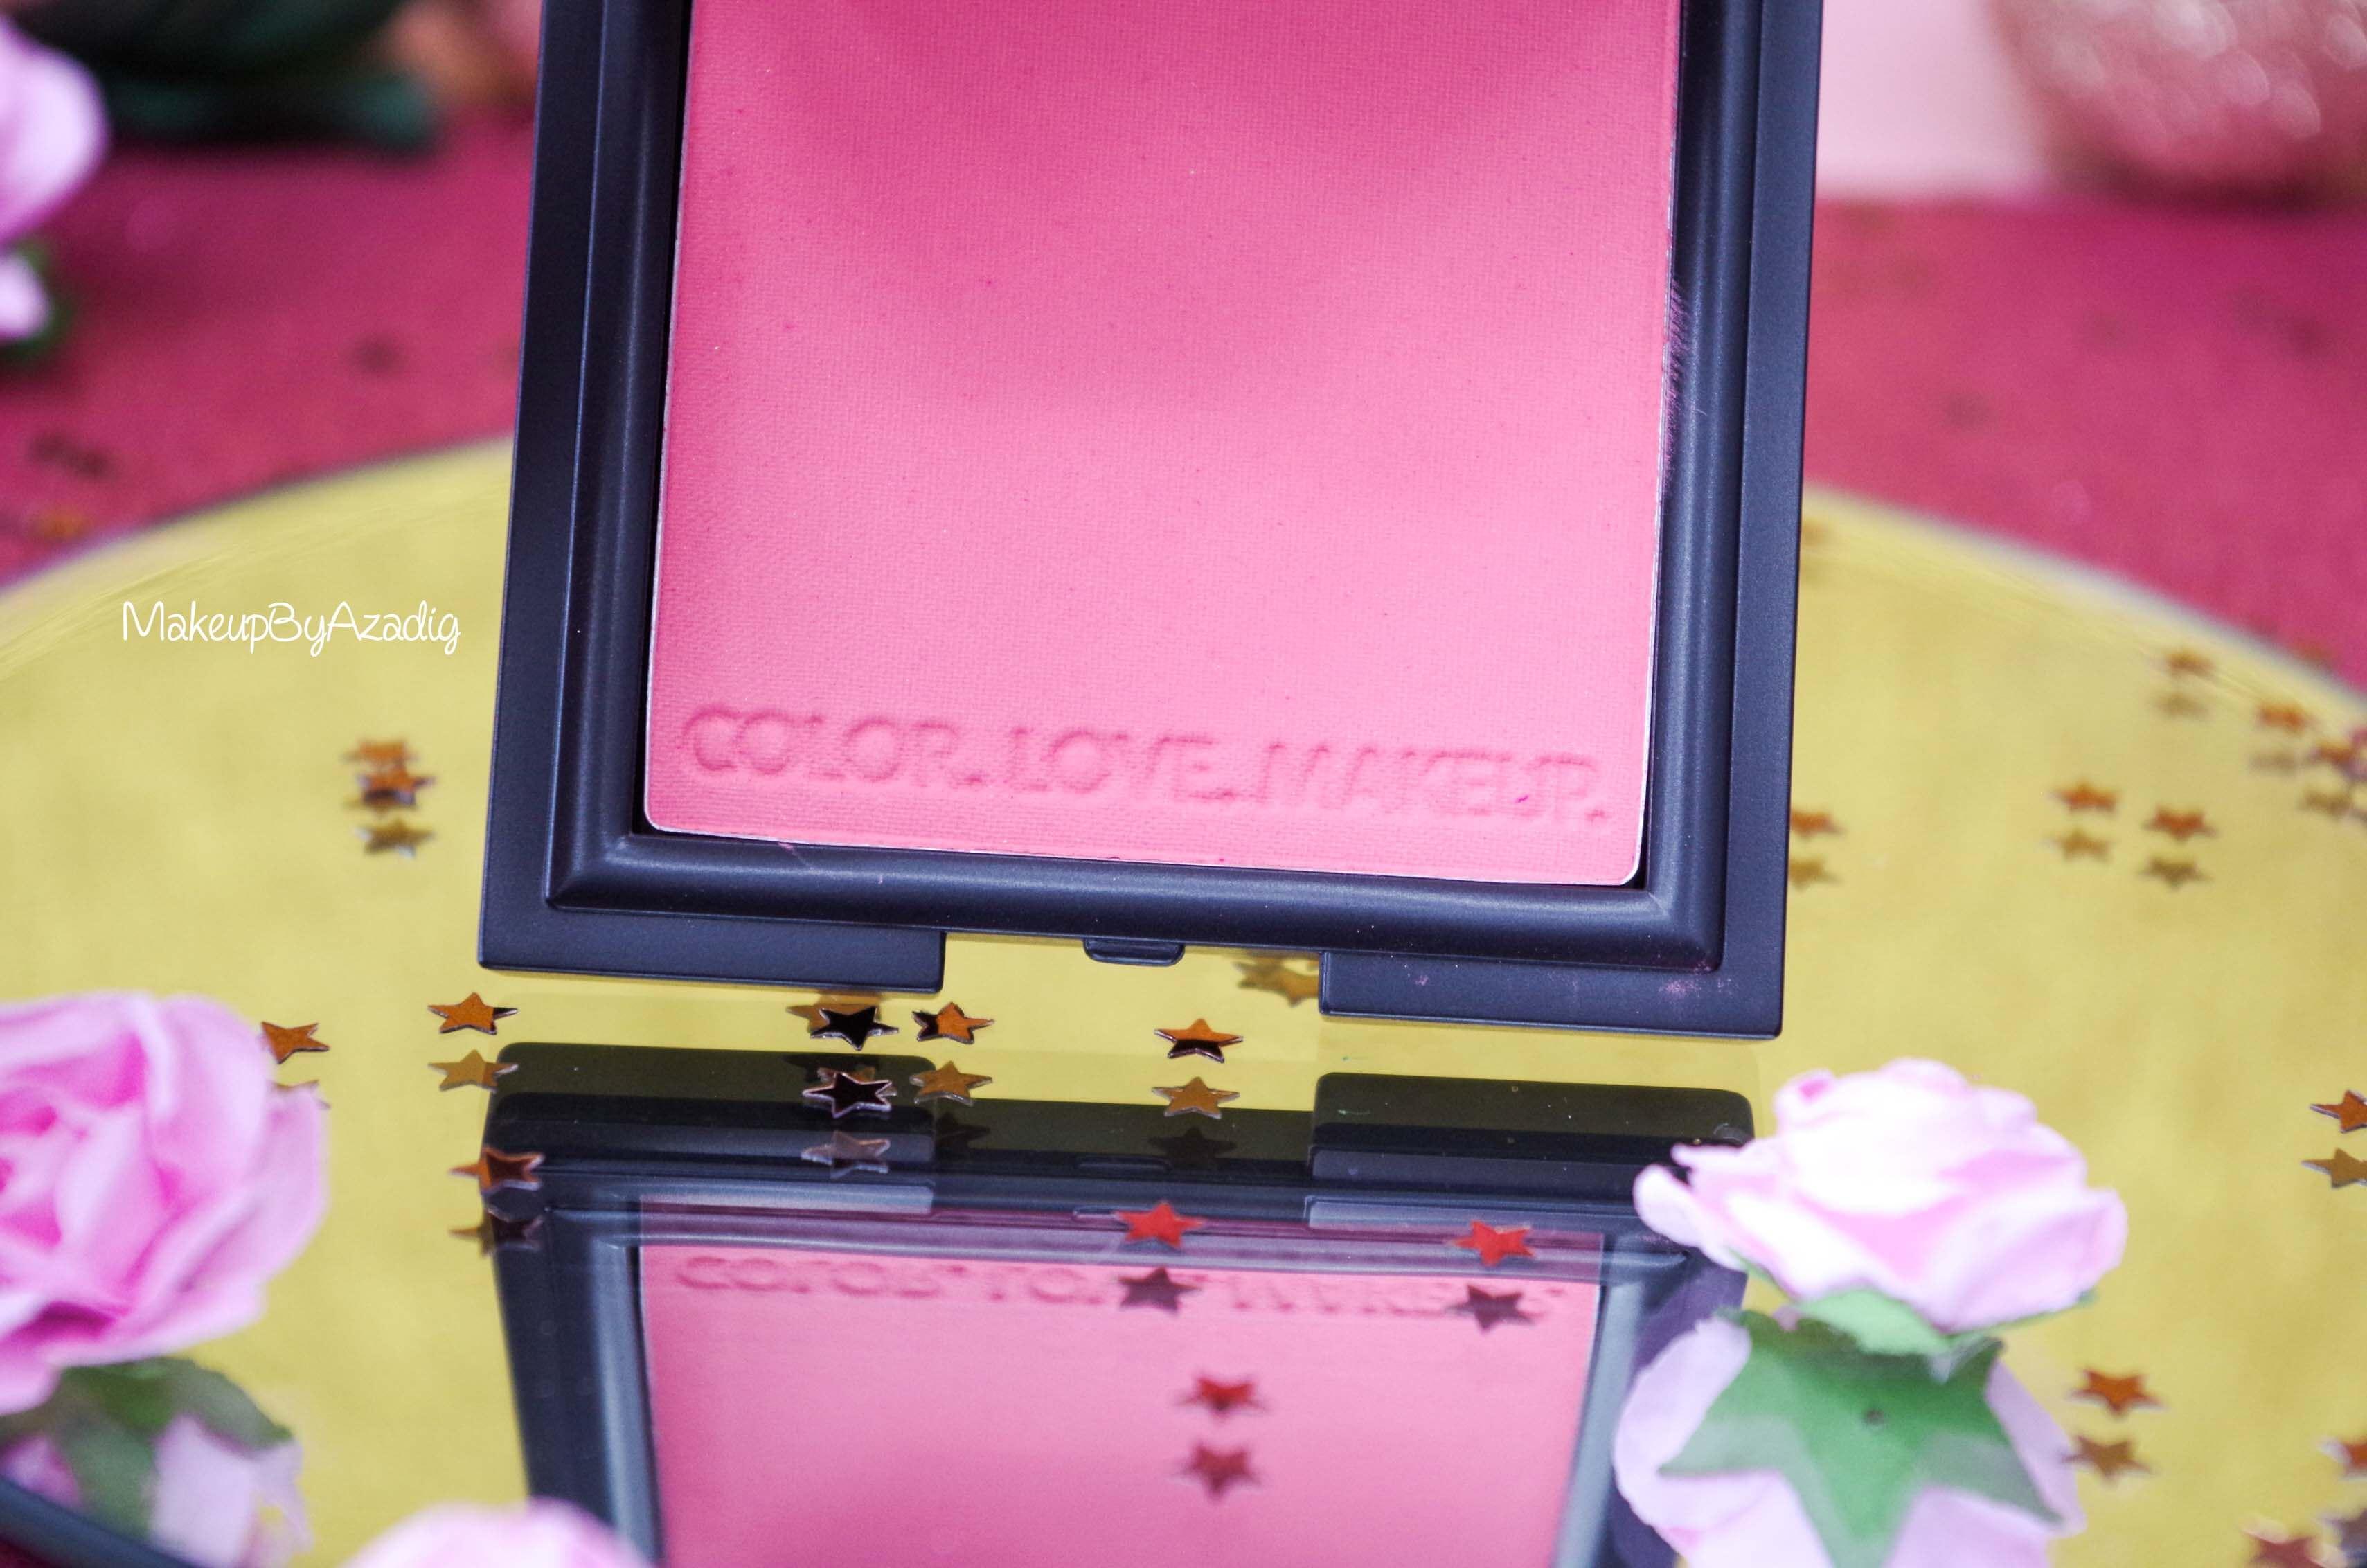 revue-review-luxe-color-blush-zoeva-sephora-france-helovesmemaybe-rush-rush-avis-swatch-makeupbyazadig-paris-makeup